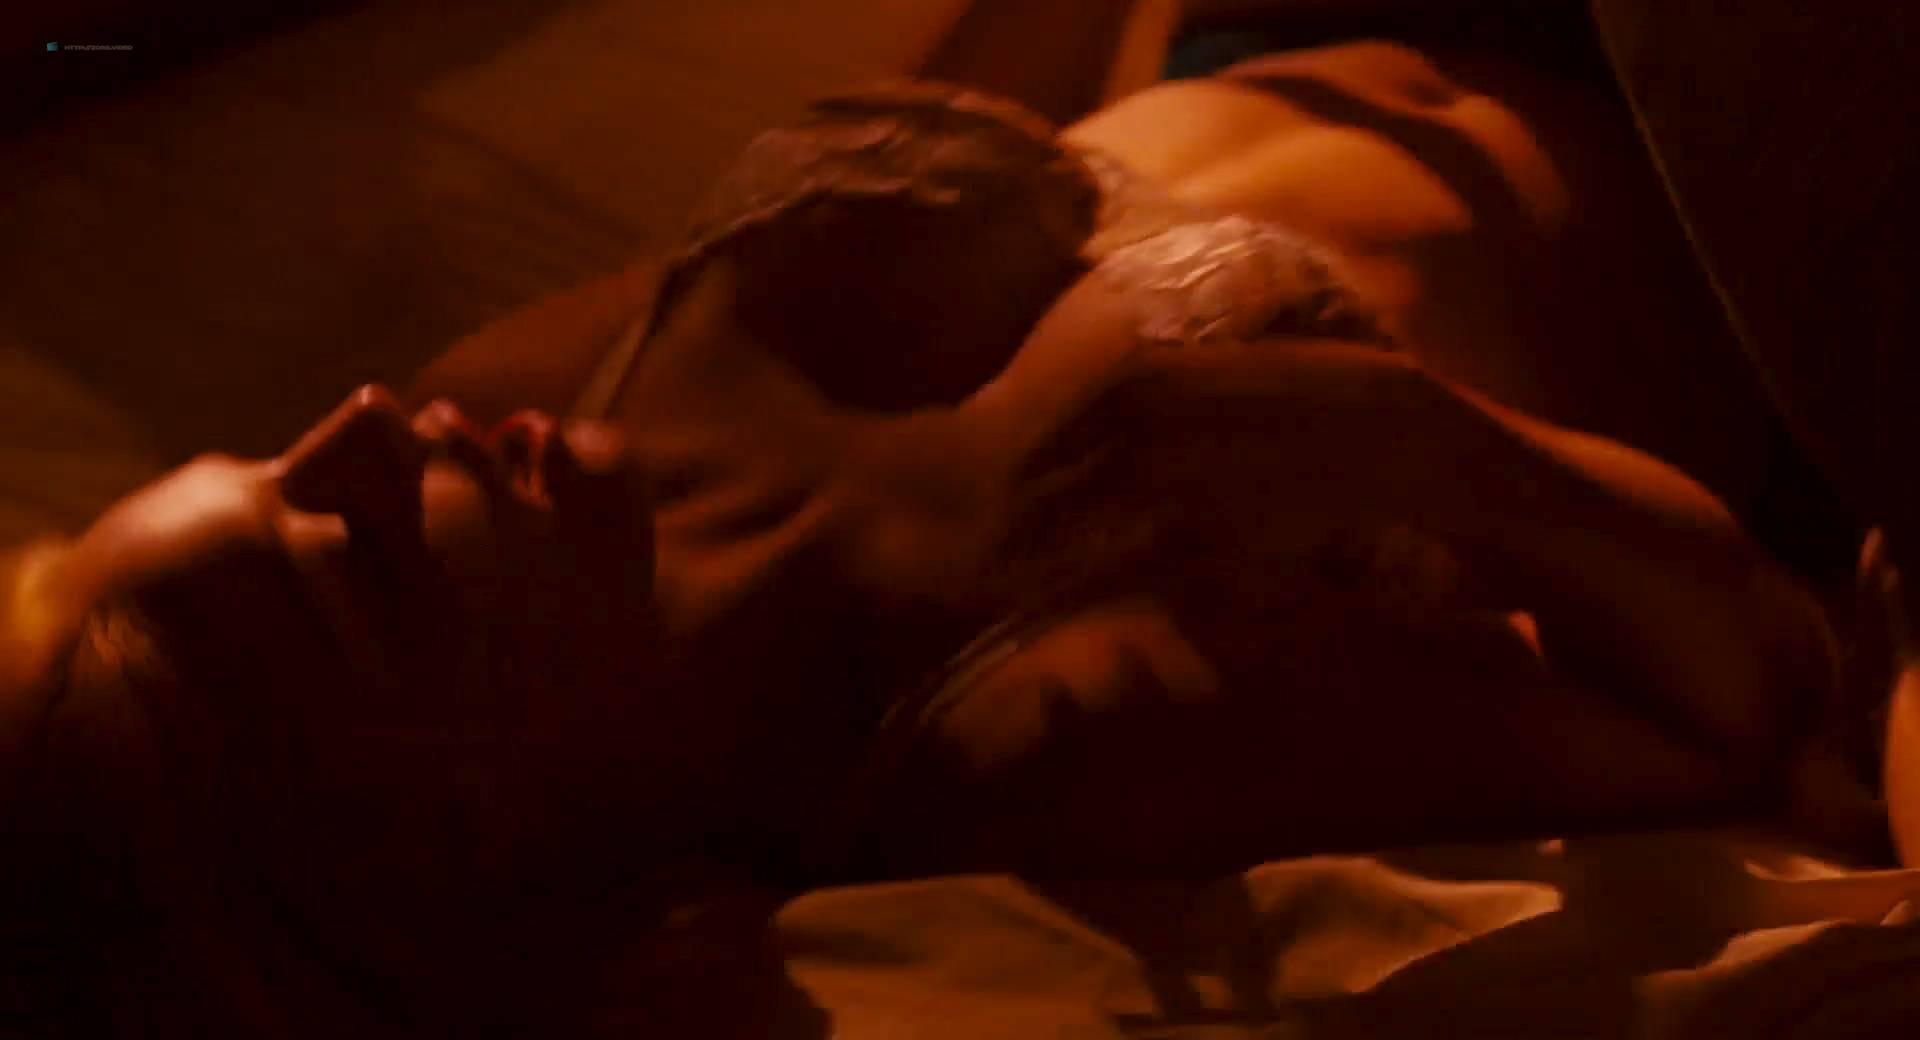 Katherine heigl side effects side effects beautiful celebrity sexy nude scene